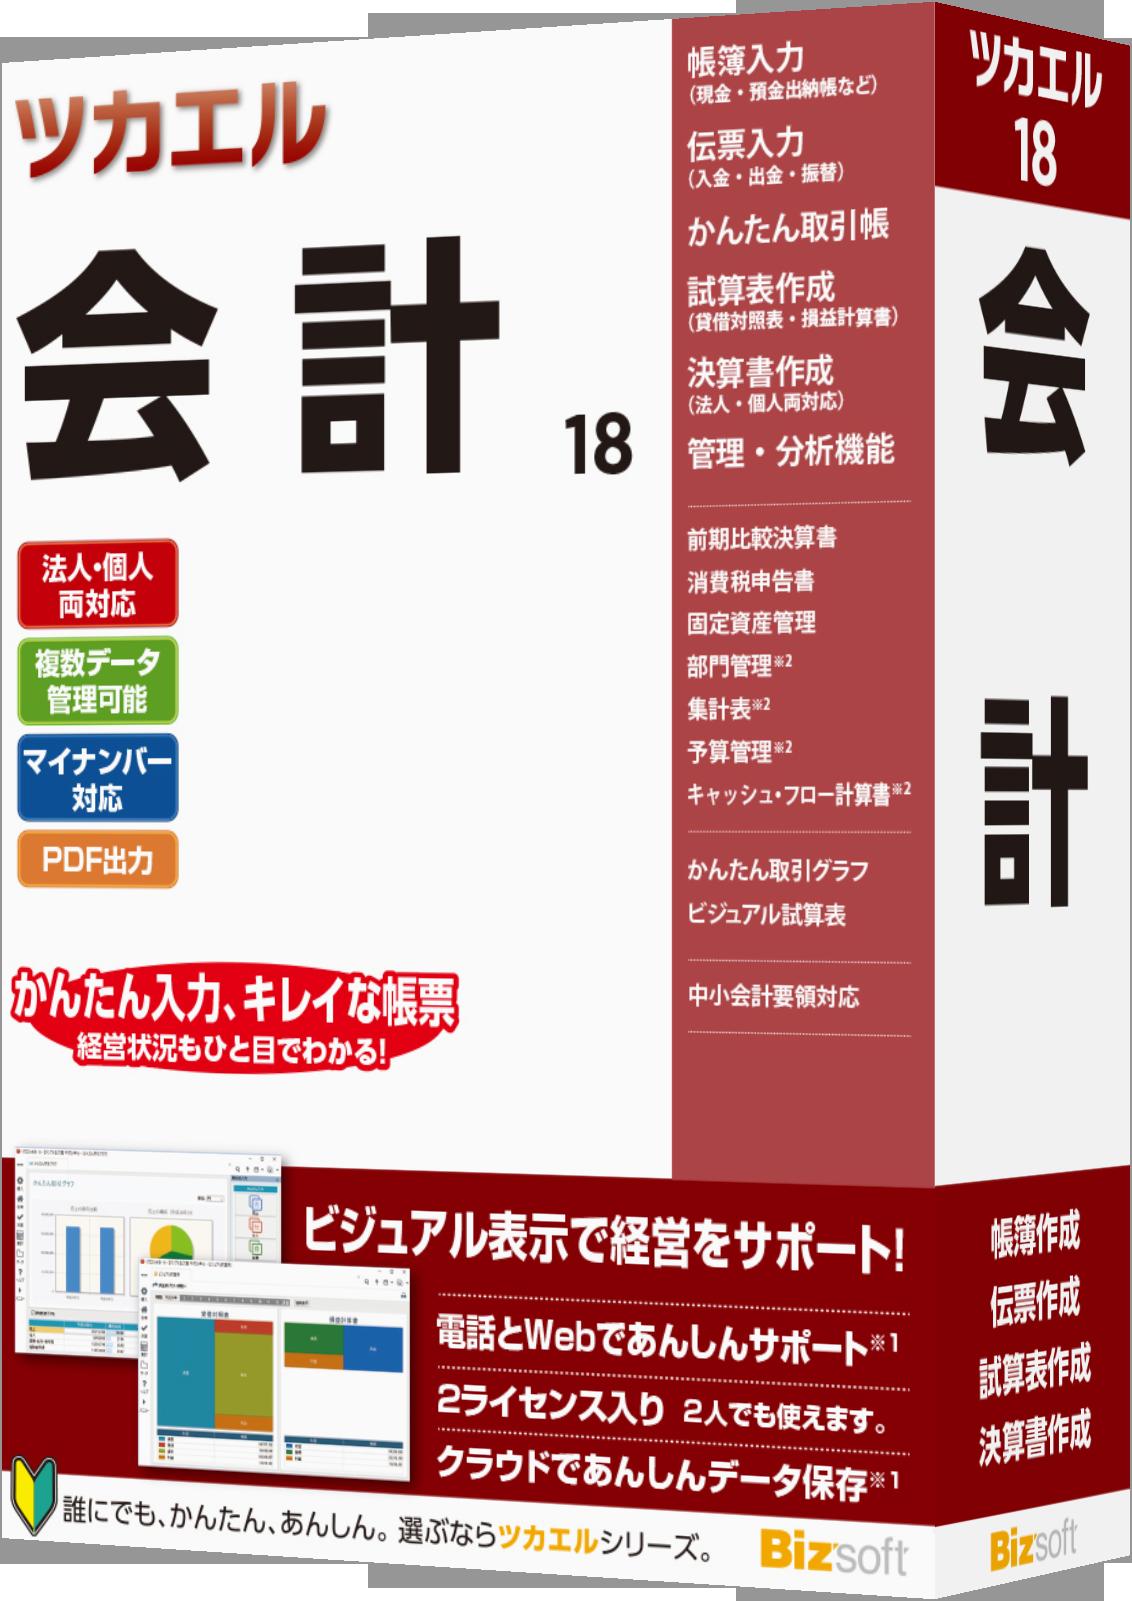 "「<a href=""https://www.bizsoft.co.jp/products/acc/index.html"">ツカエル会計 18</a>」パッケージ"